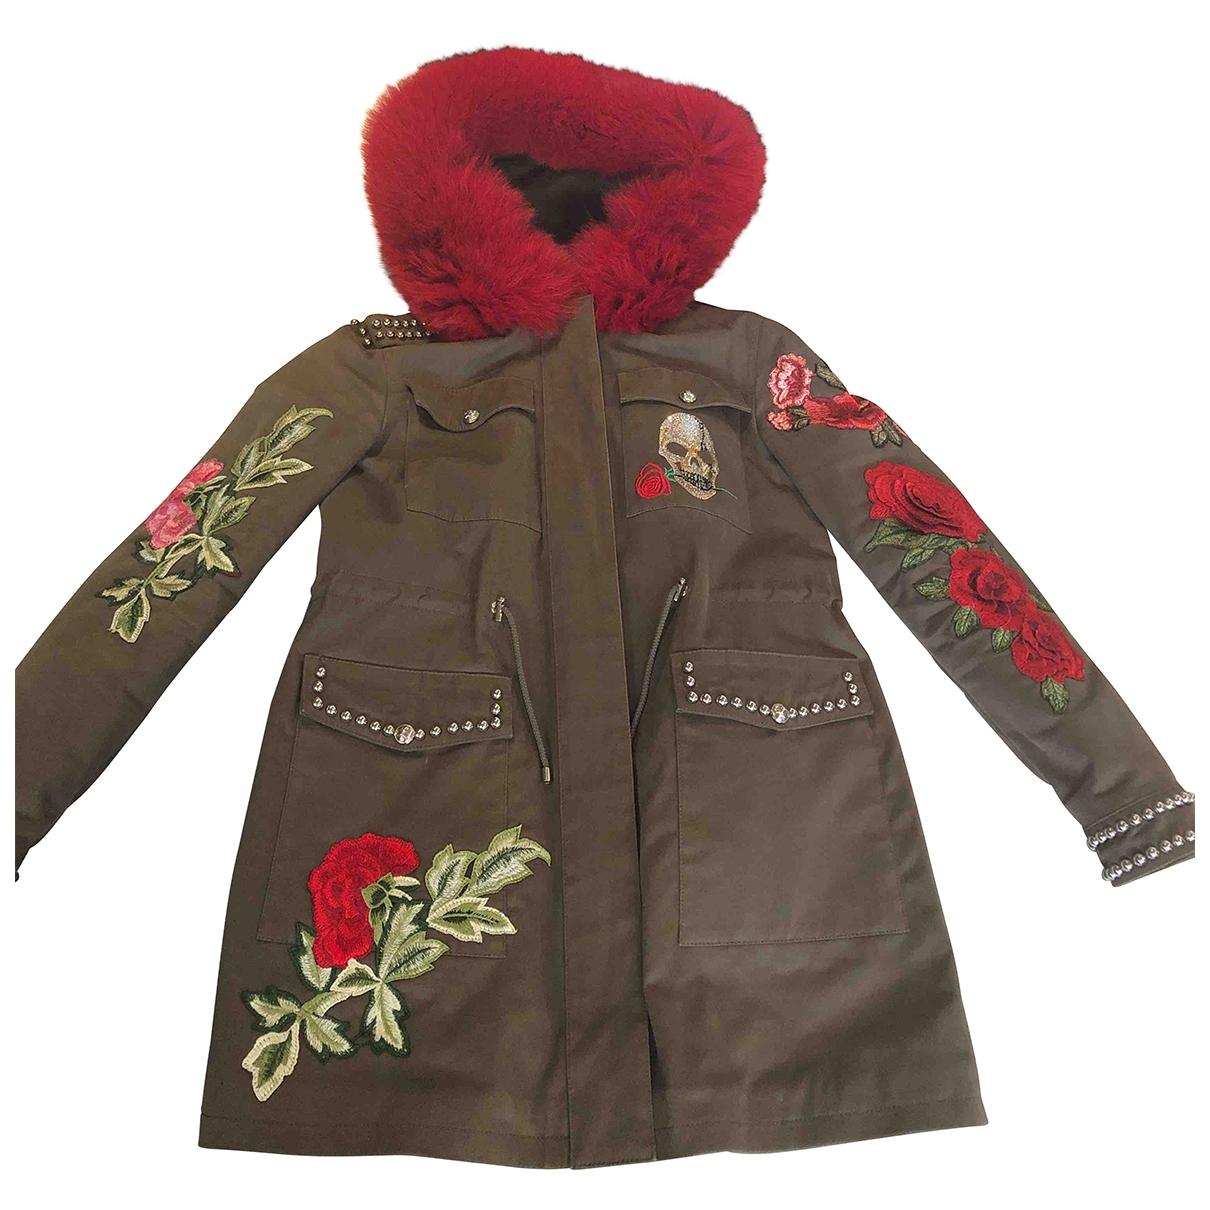 Philipp Plein \N Green coat for Women M International